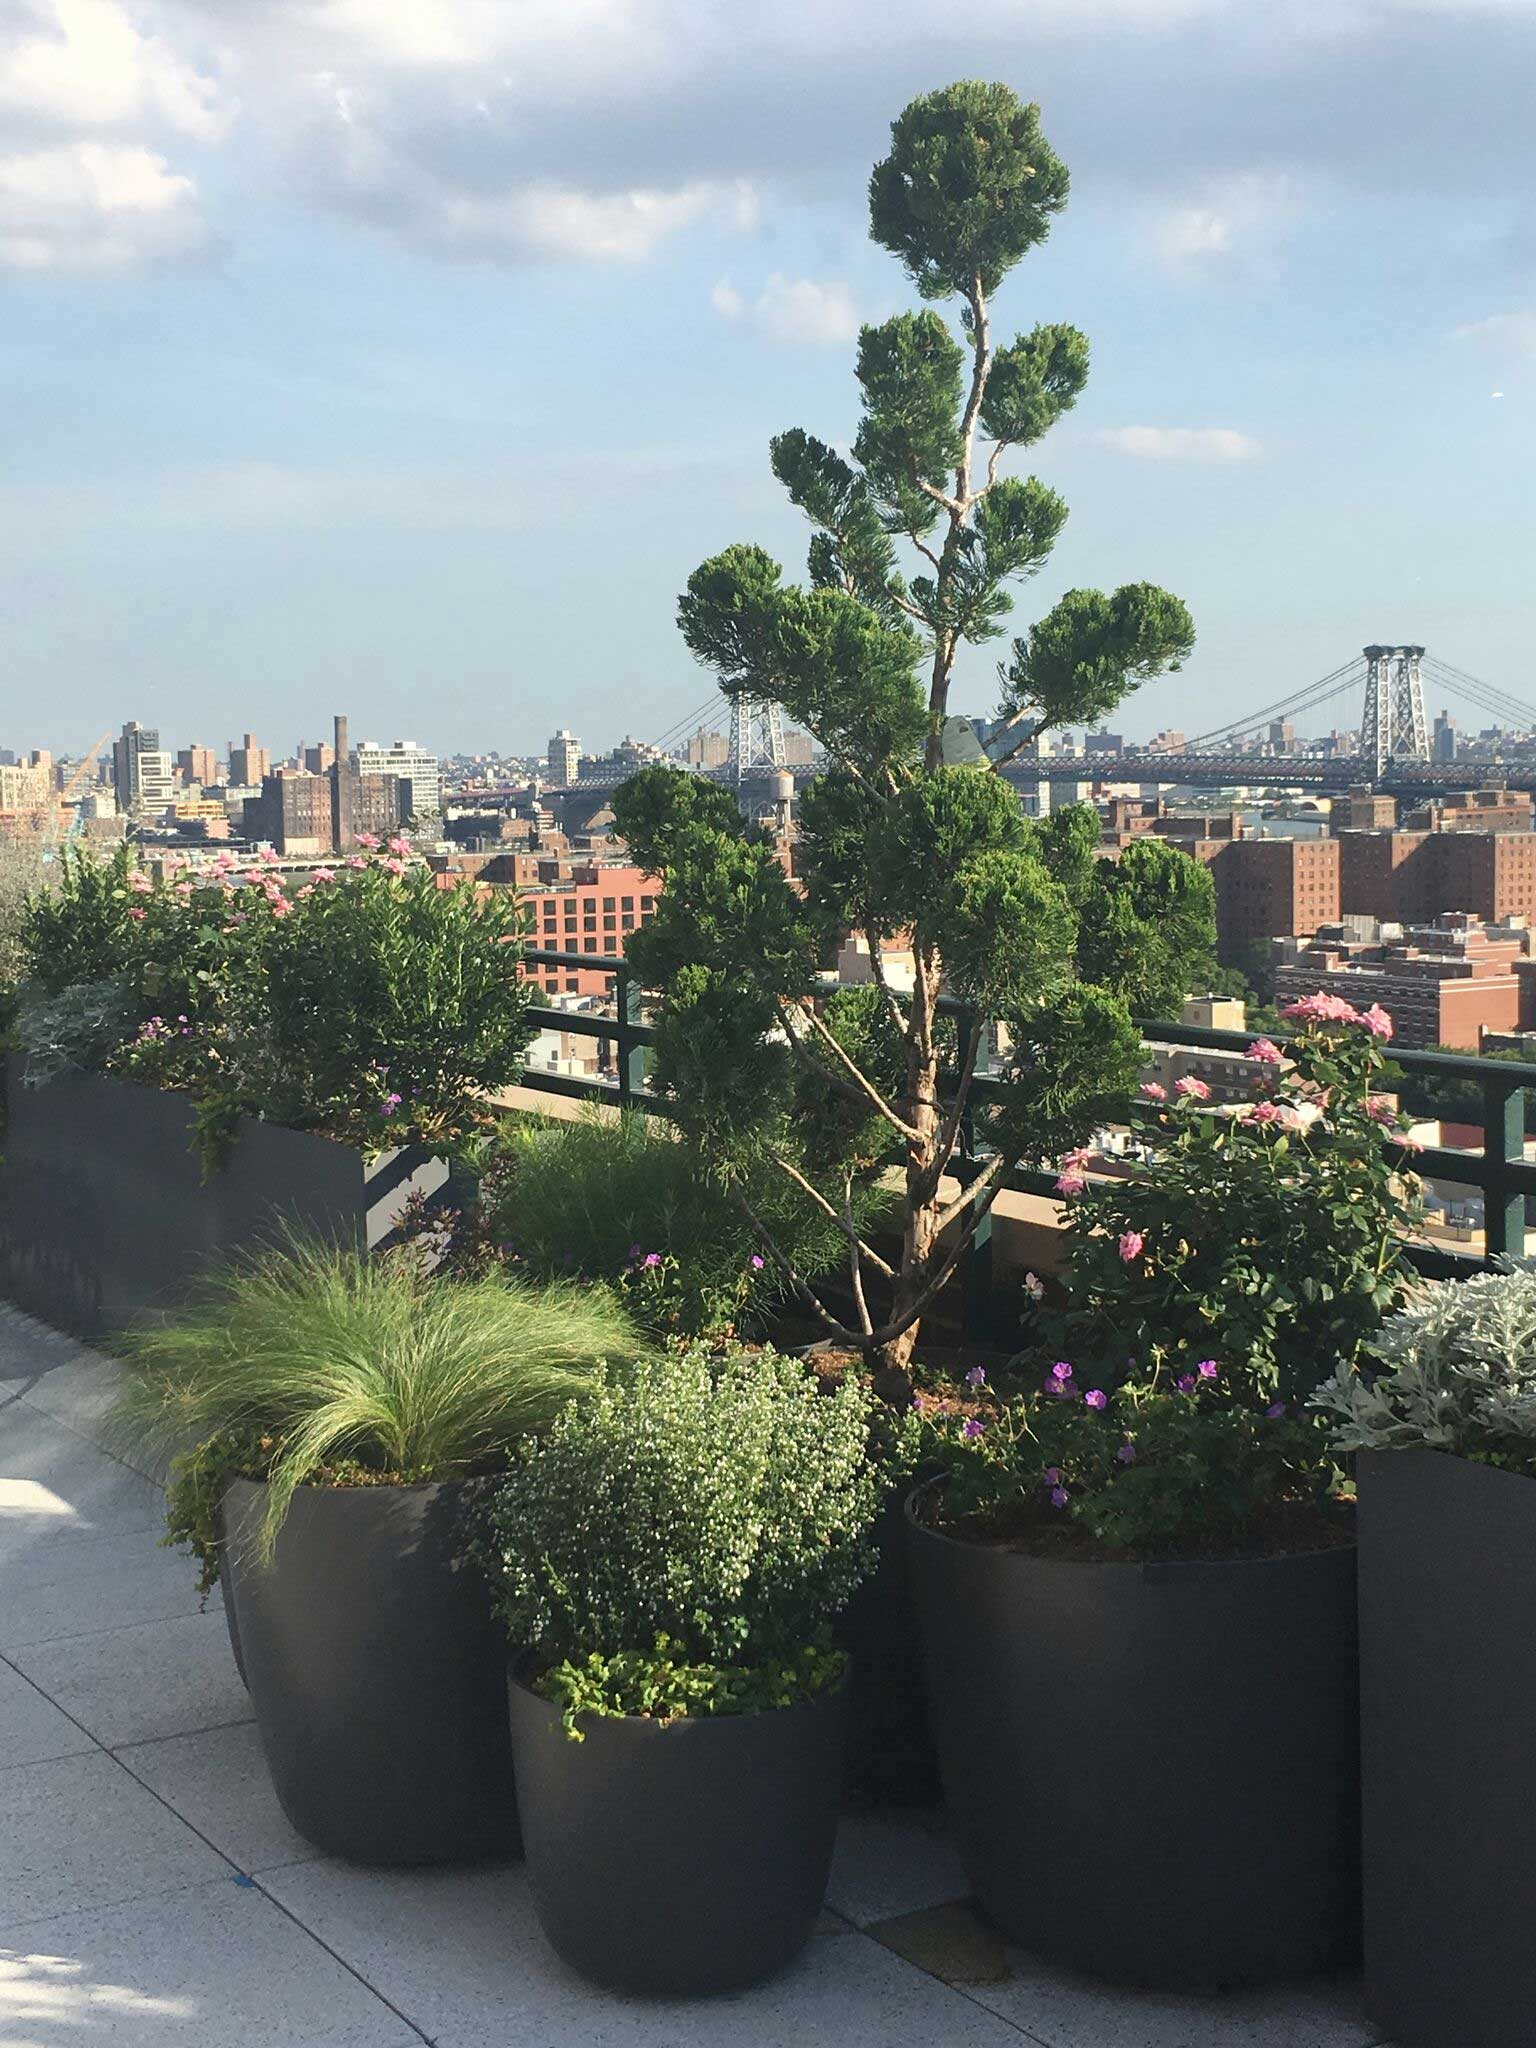 Roof Terrace Garden, New York, New York